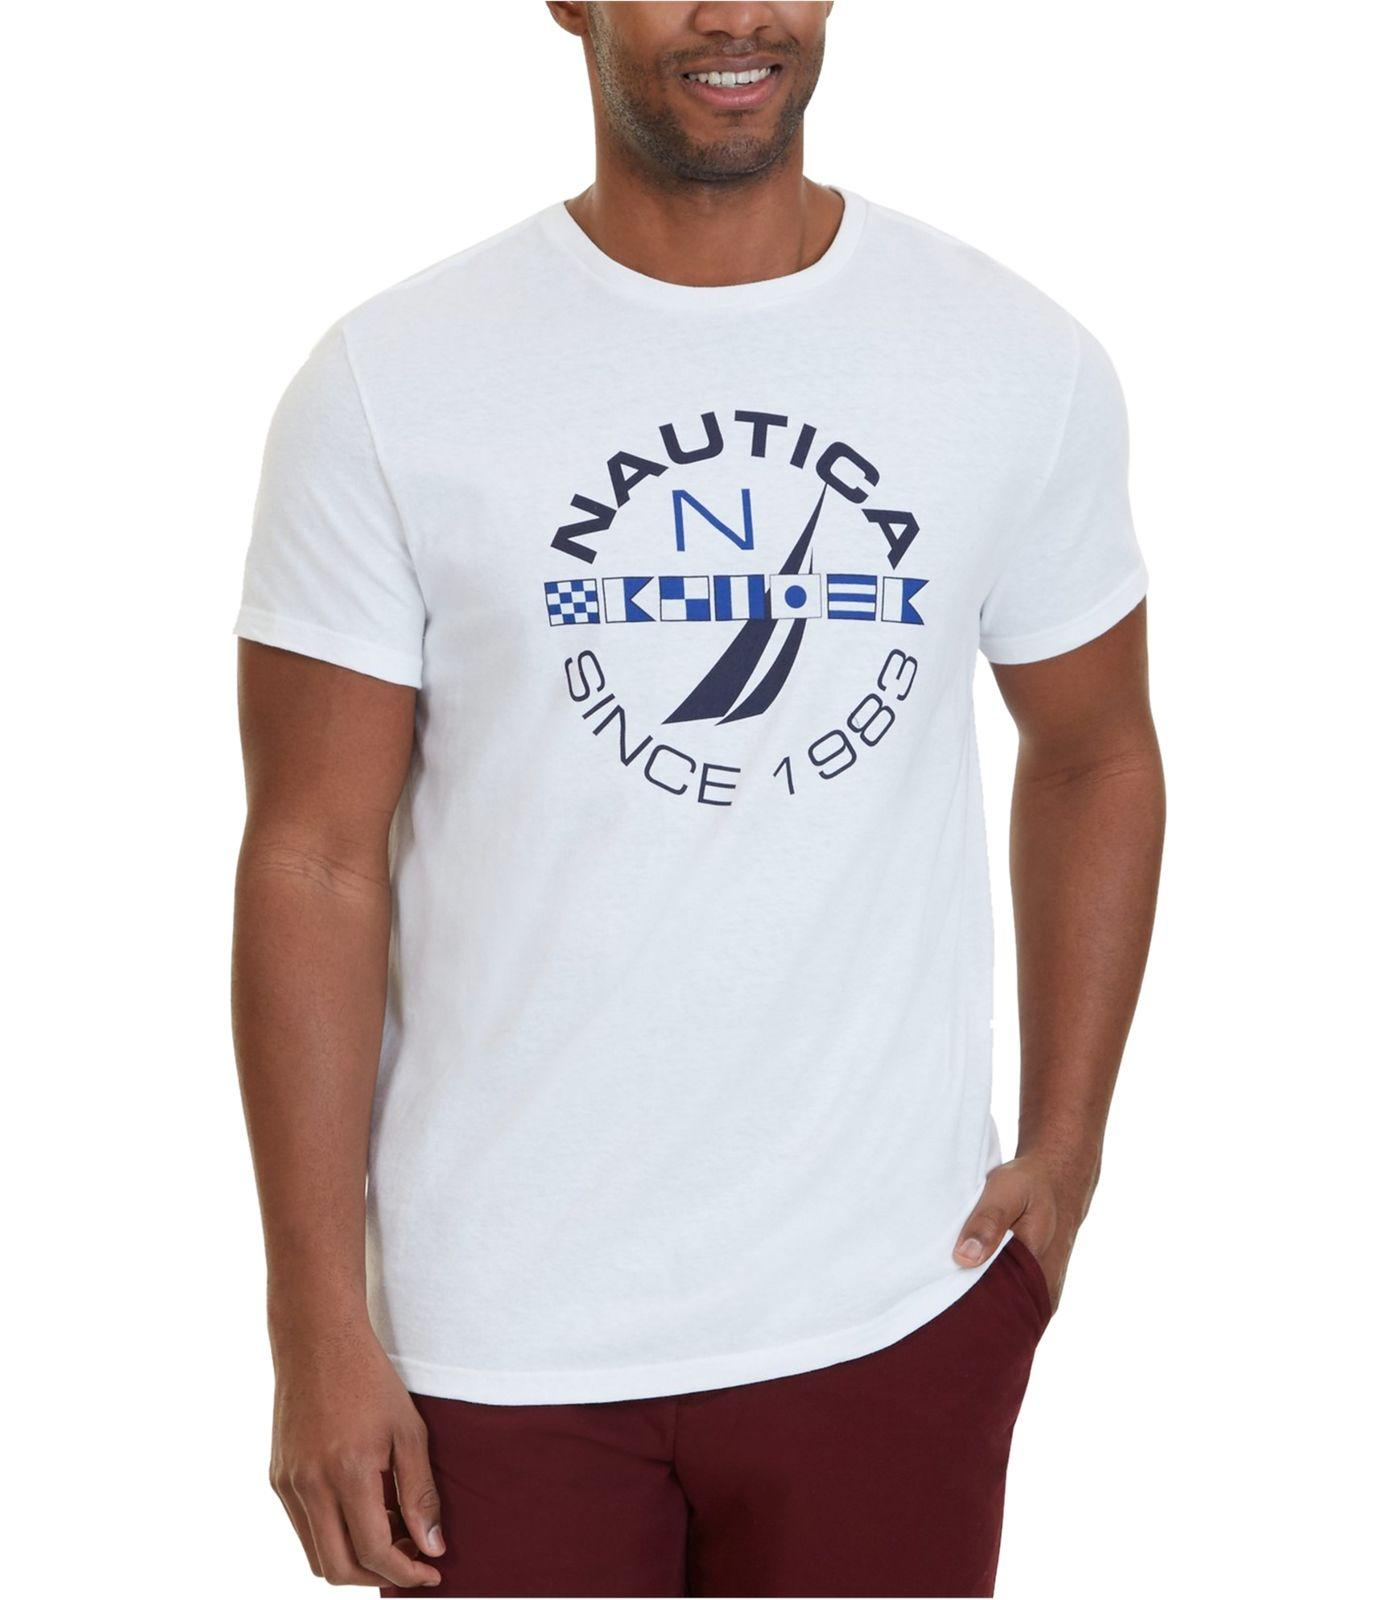 78002da56fb8 Nautica Mens Exclusive Logo Graphic T Shirt T Shirt Shopping Online T Shirt  Humor From Brawtees, $11.01  DHgate.Com